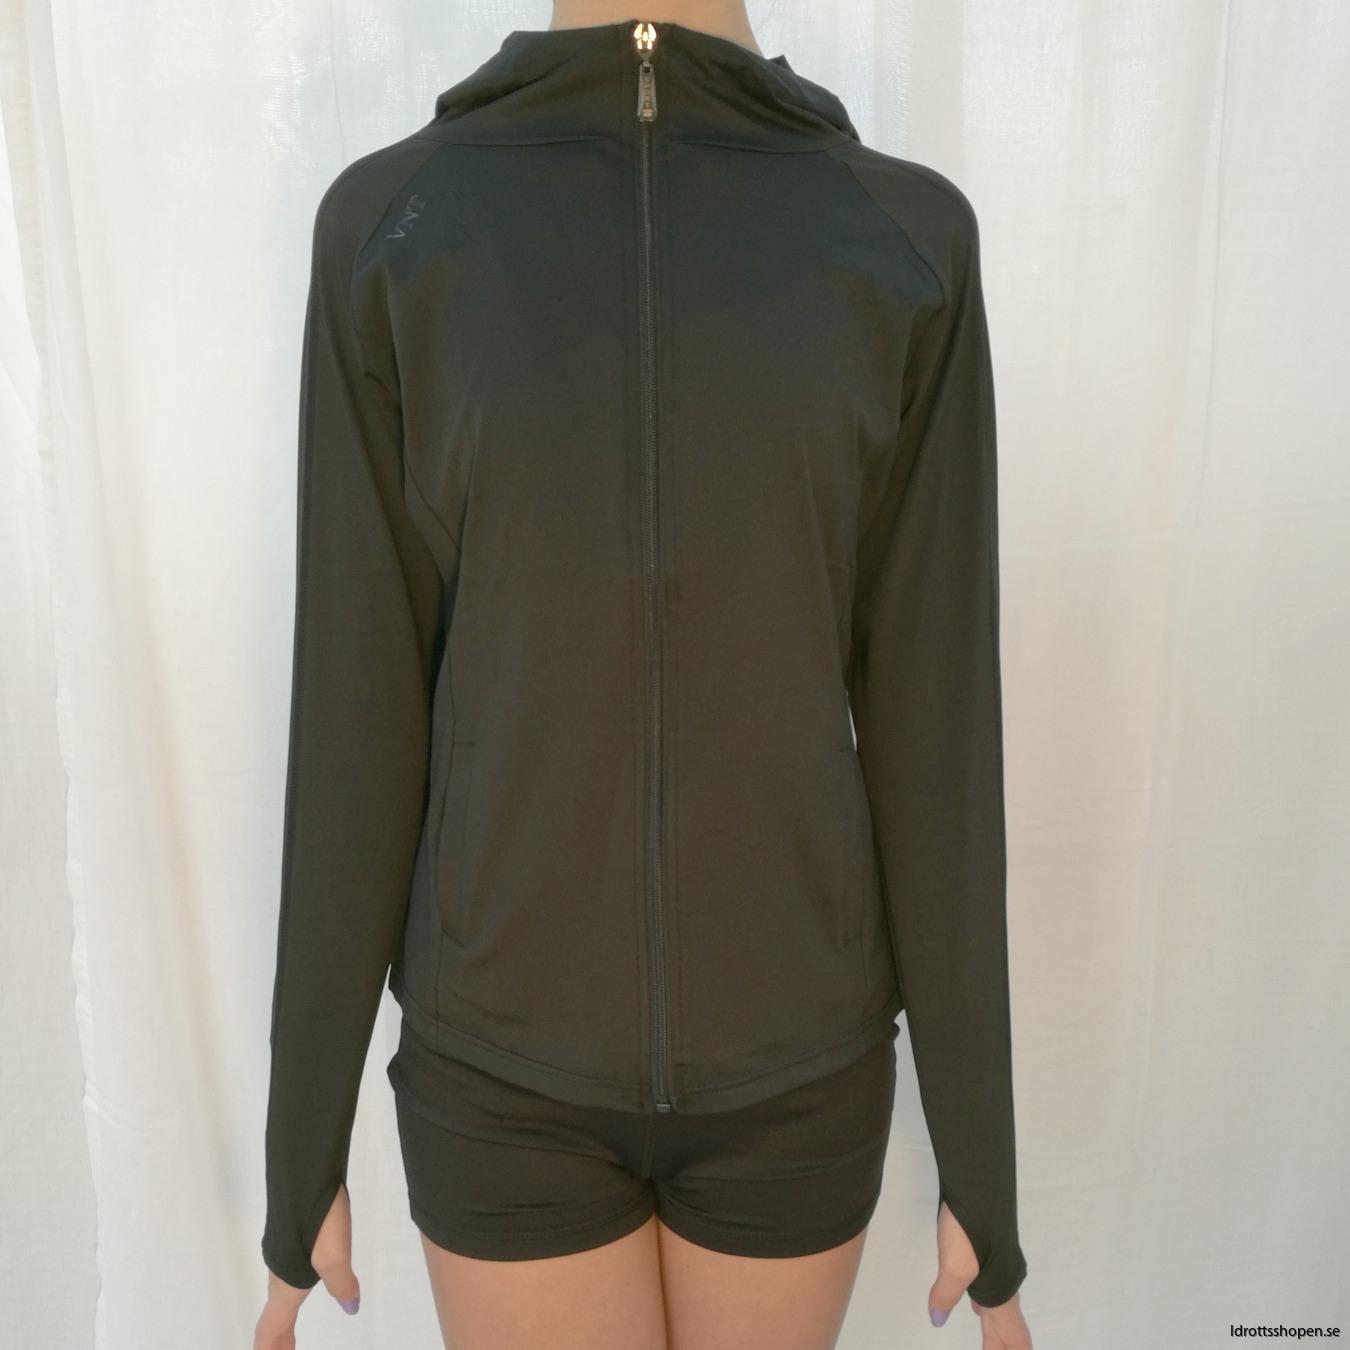 Venturelli hoodie 3